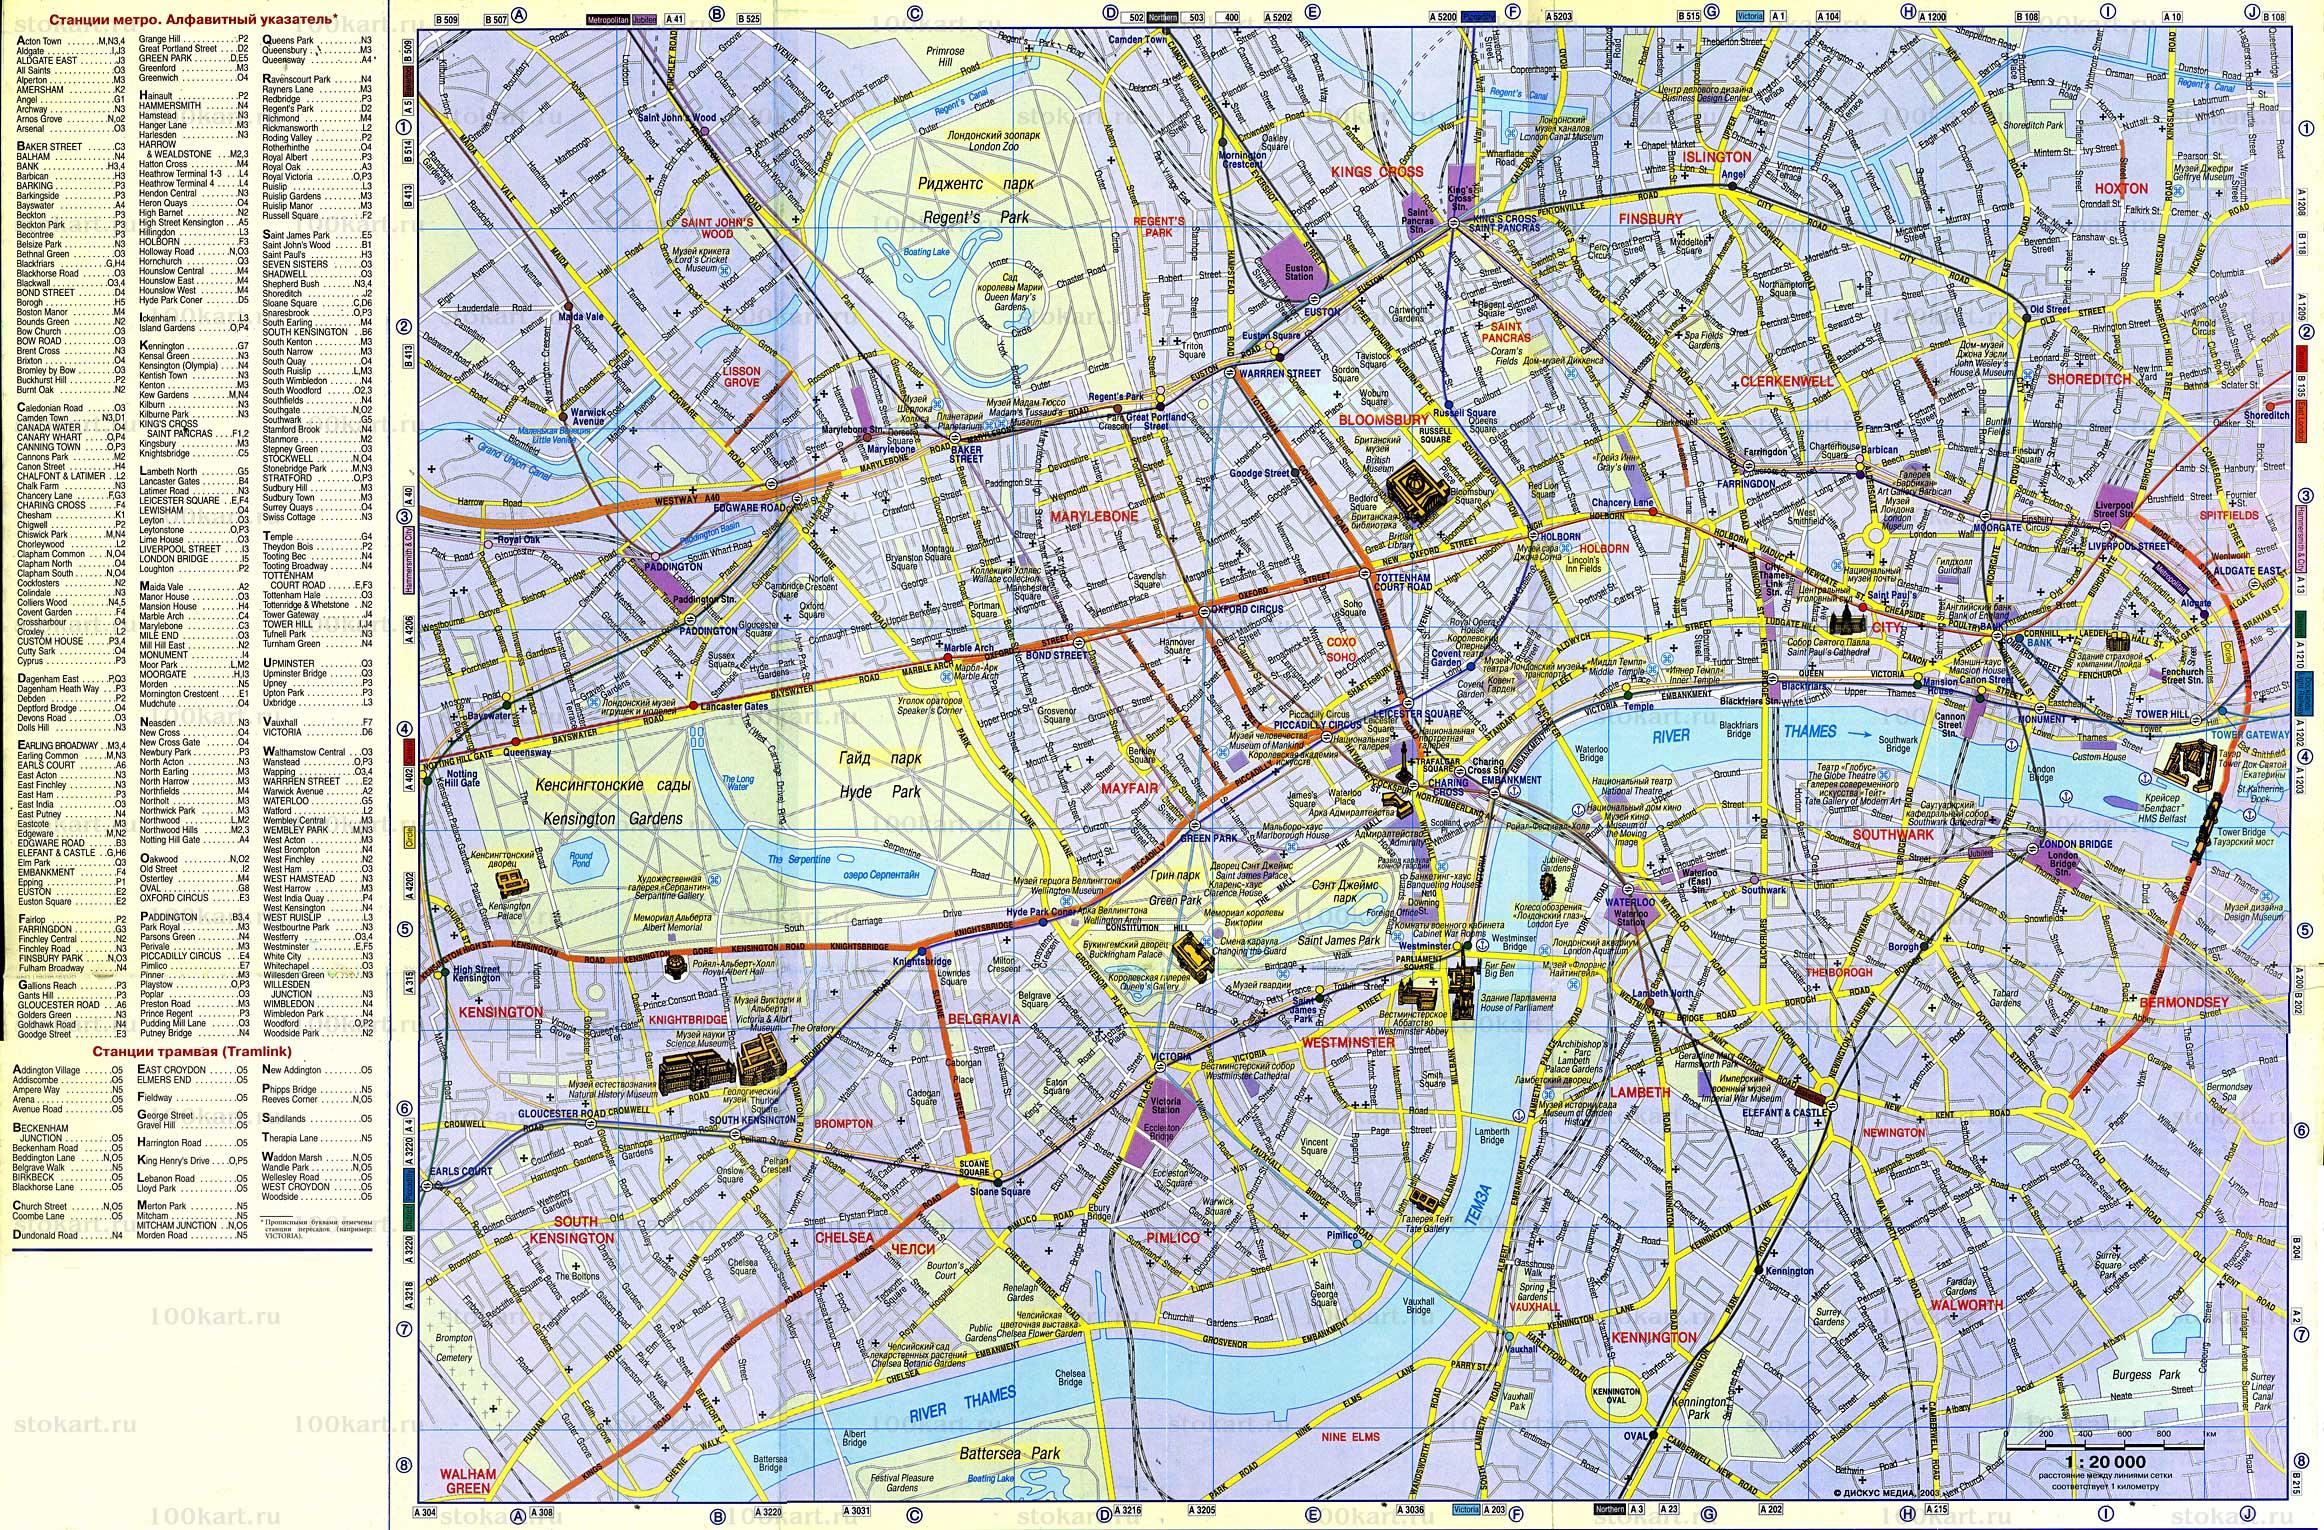 Карта центральной части Лондона: http://www.stokart.ru/index/gb/london/doplondon/doplondon_498.html?template=48